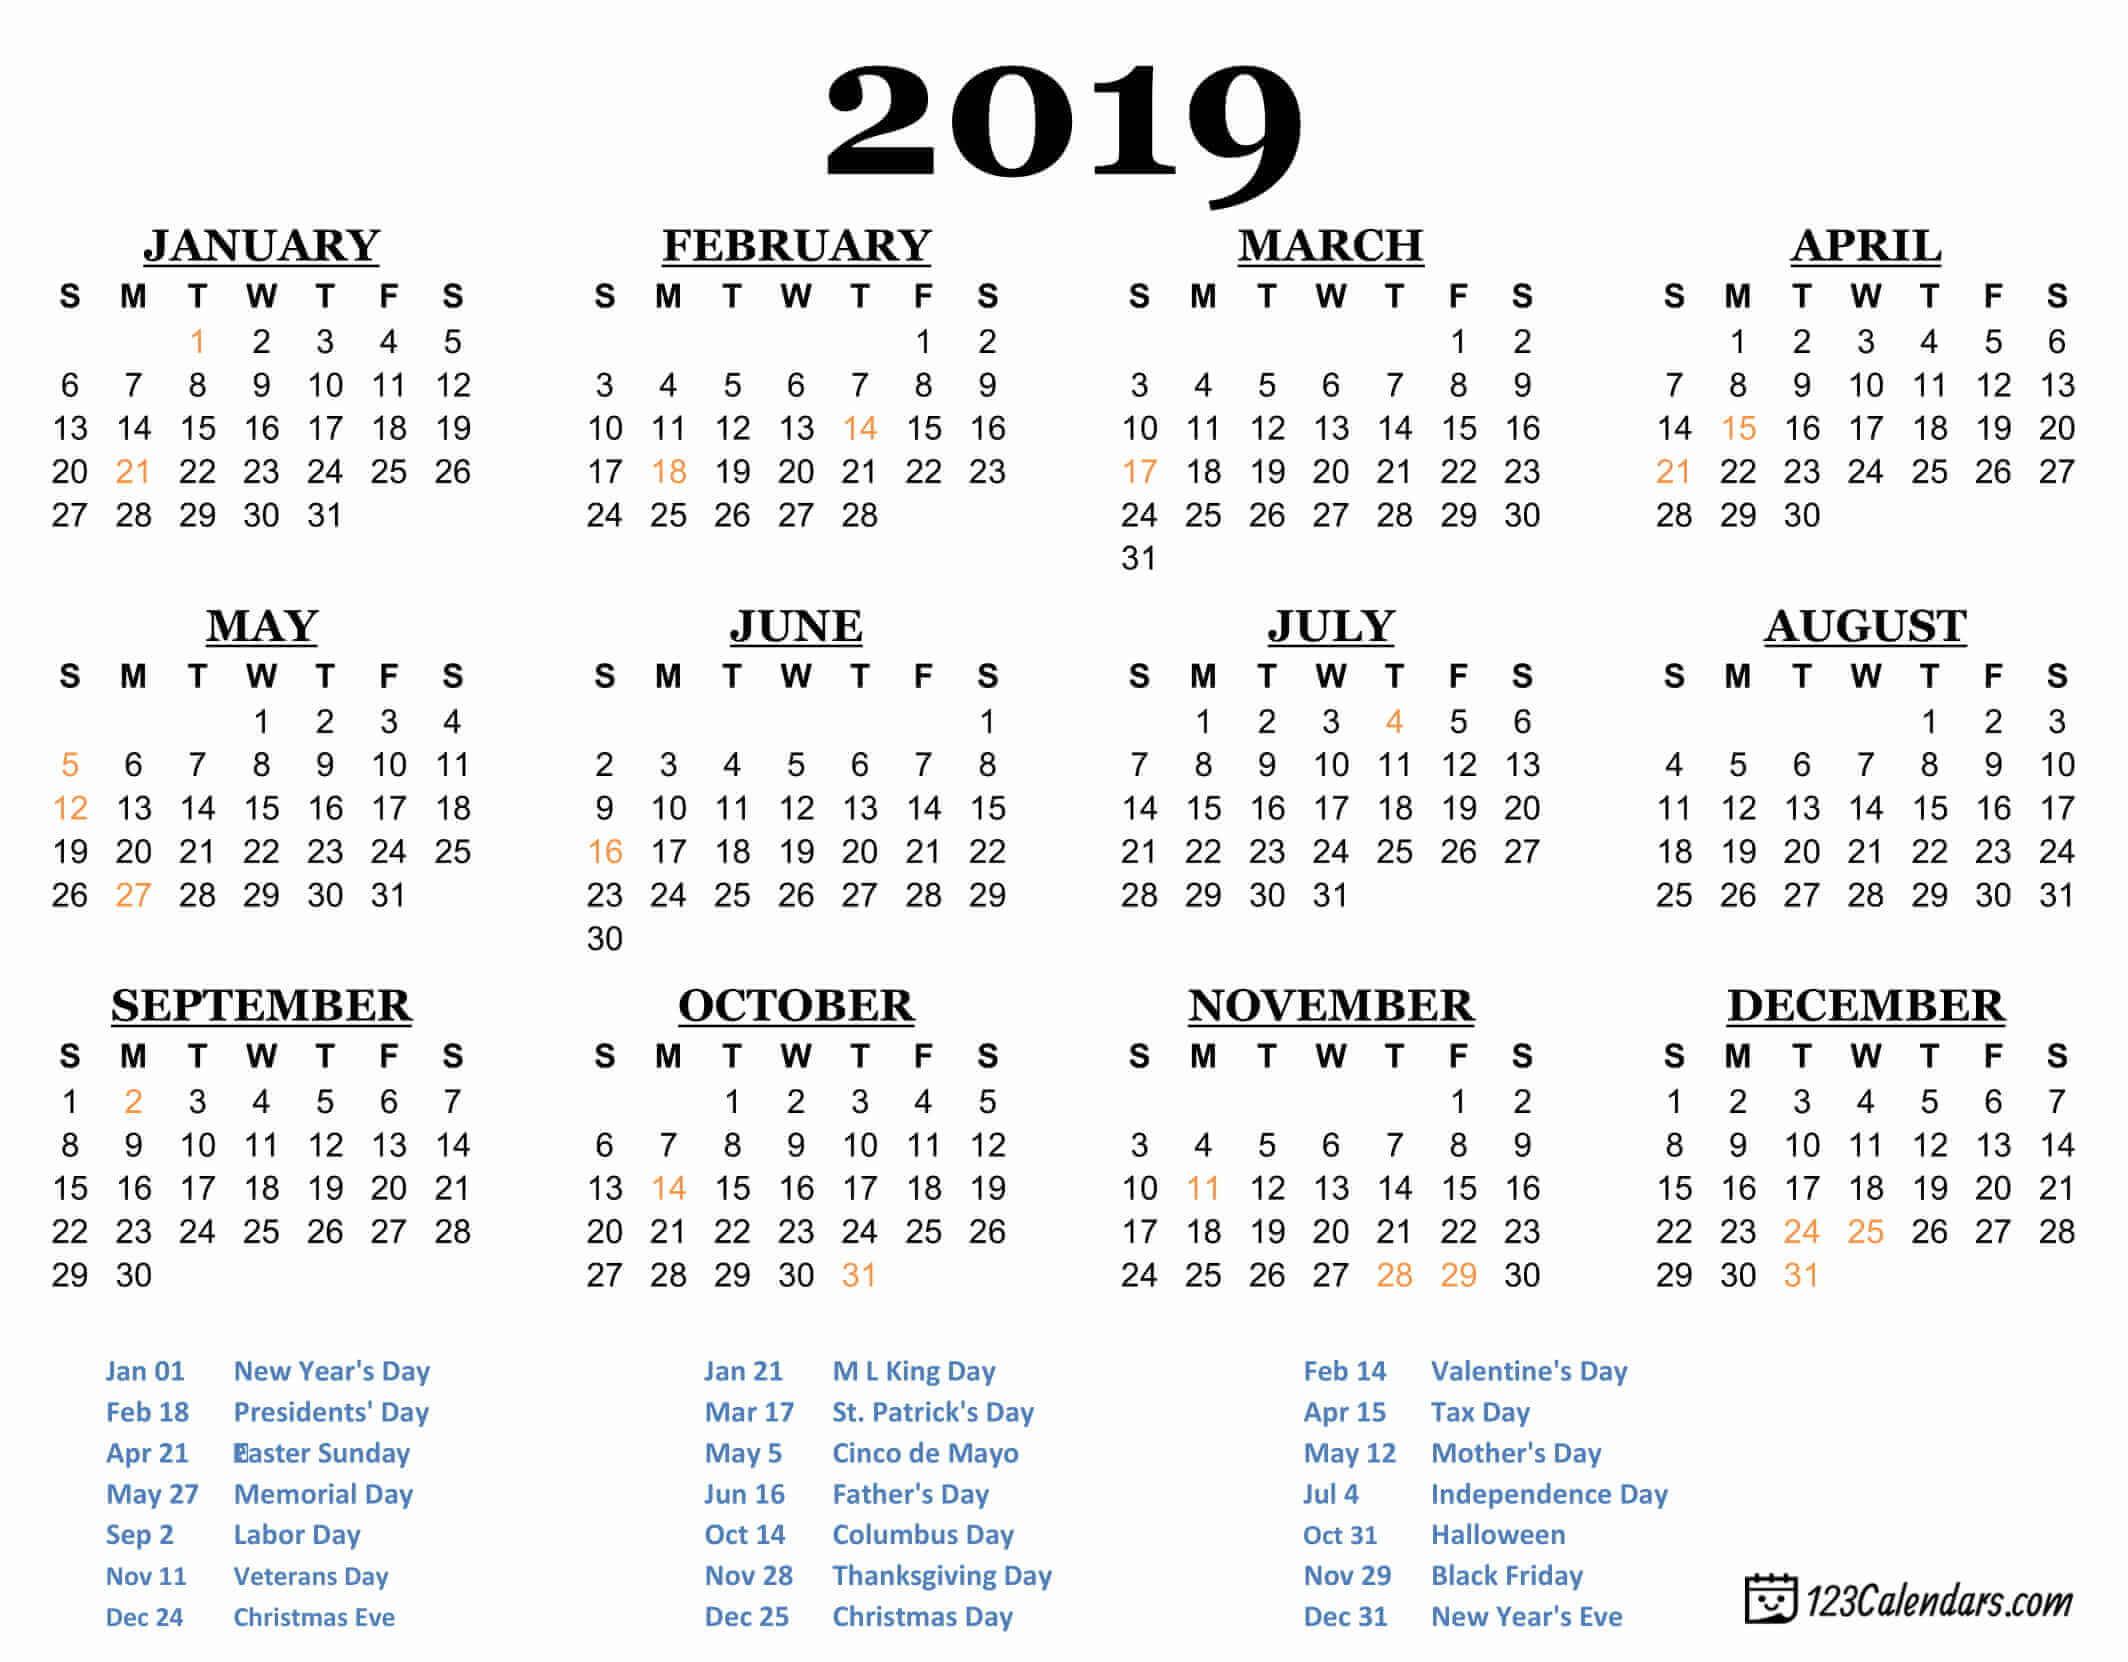 Free Printable 2019 Calendar | 123Calendars for Calendar October 2019 Pocket Calendar